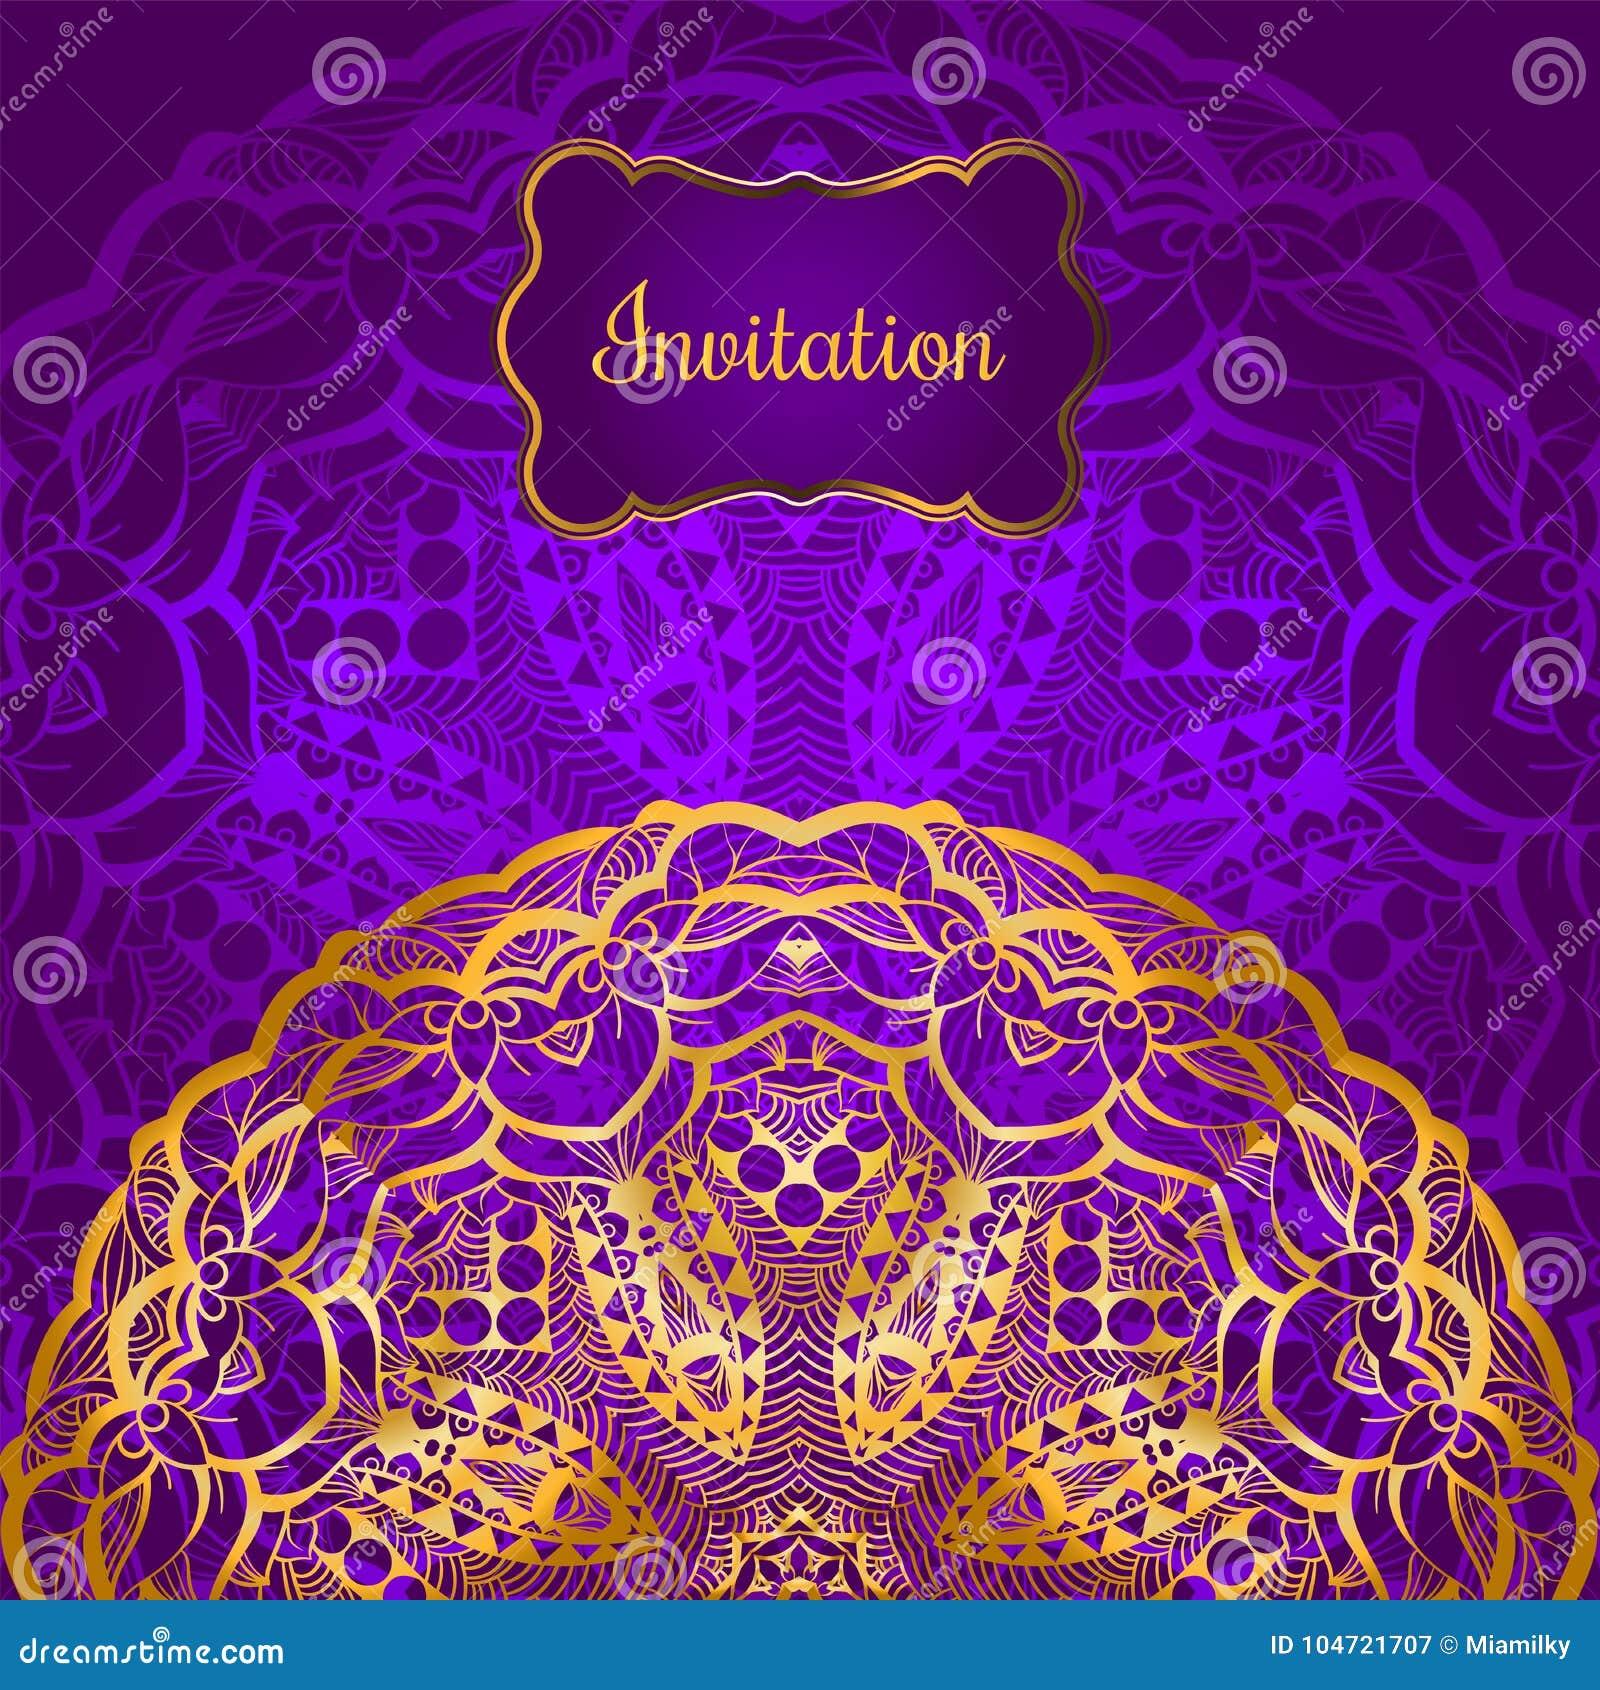 Invitation Card Design Stock Vector Illustration Of